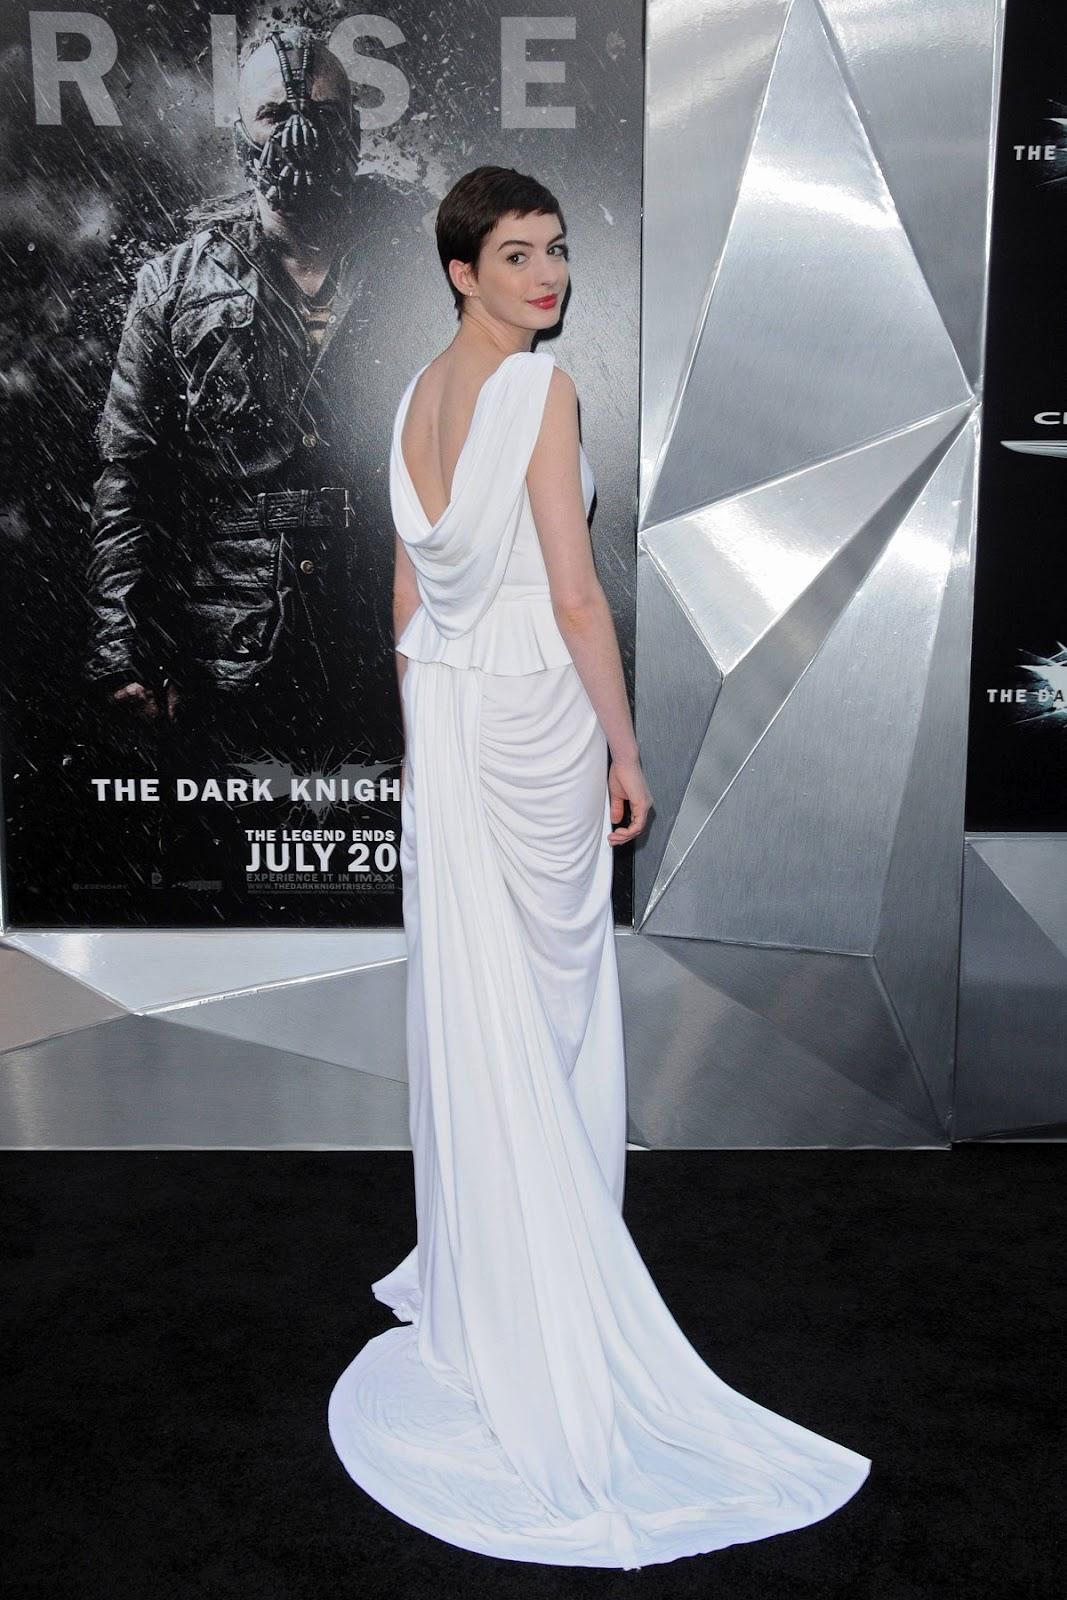 http://4.bp.blogspot.com/-YoeR-pwVGtA/UAVwKQpnlXI/AAAAAAAAd7U/ZY_SQ5ooFcY/s1600/ANNE-HATHAWAY-at-Dark-Knight-Rises-Premiere-in-New-York-4.jpg